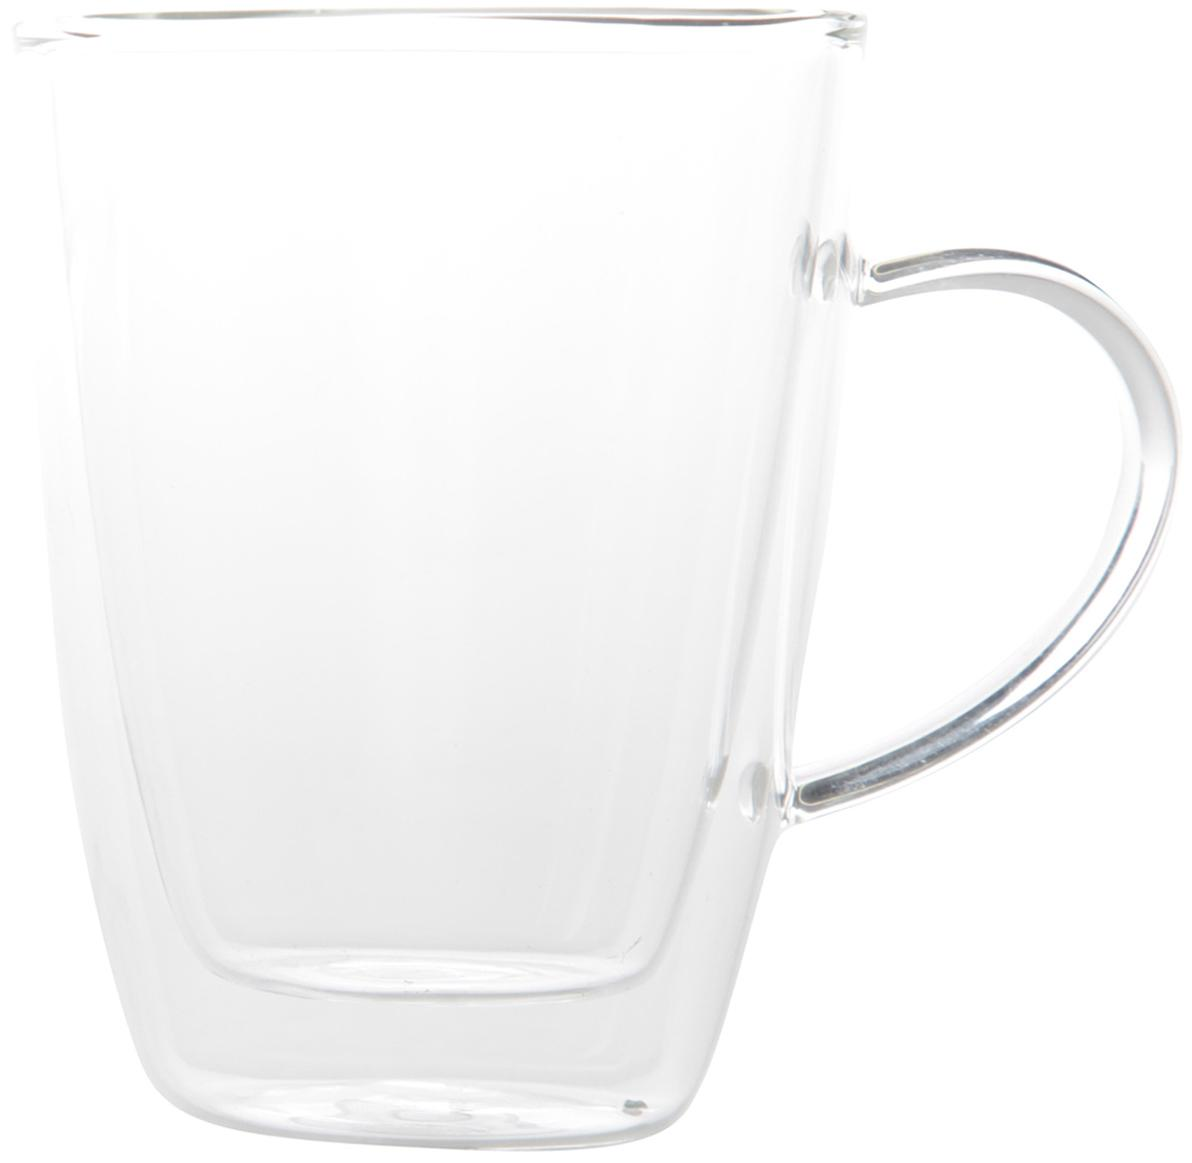 Bicchieri da tè a doppia parete Isolate, 2 pz., Vetro borosilicato, Trasparente, Ø 9 x Alt. 12 cm